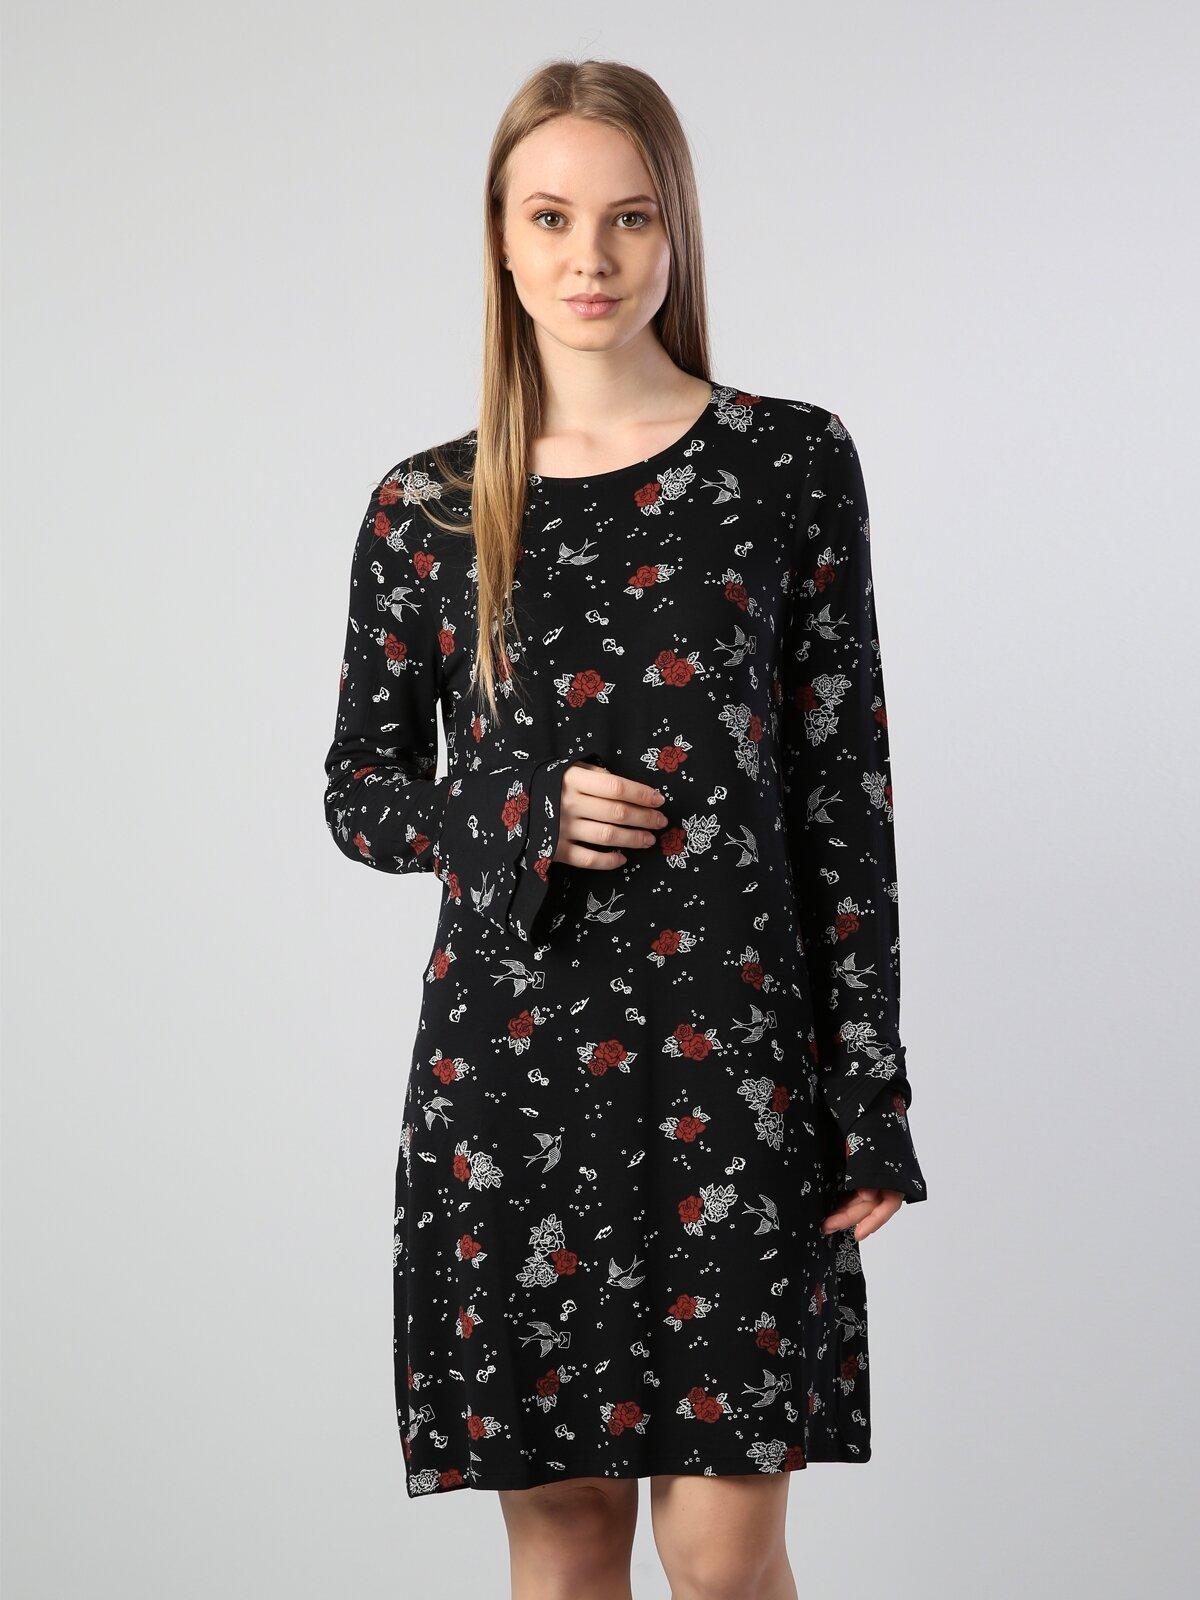 Comfort Fitkadın Elbise